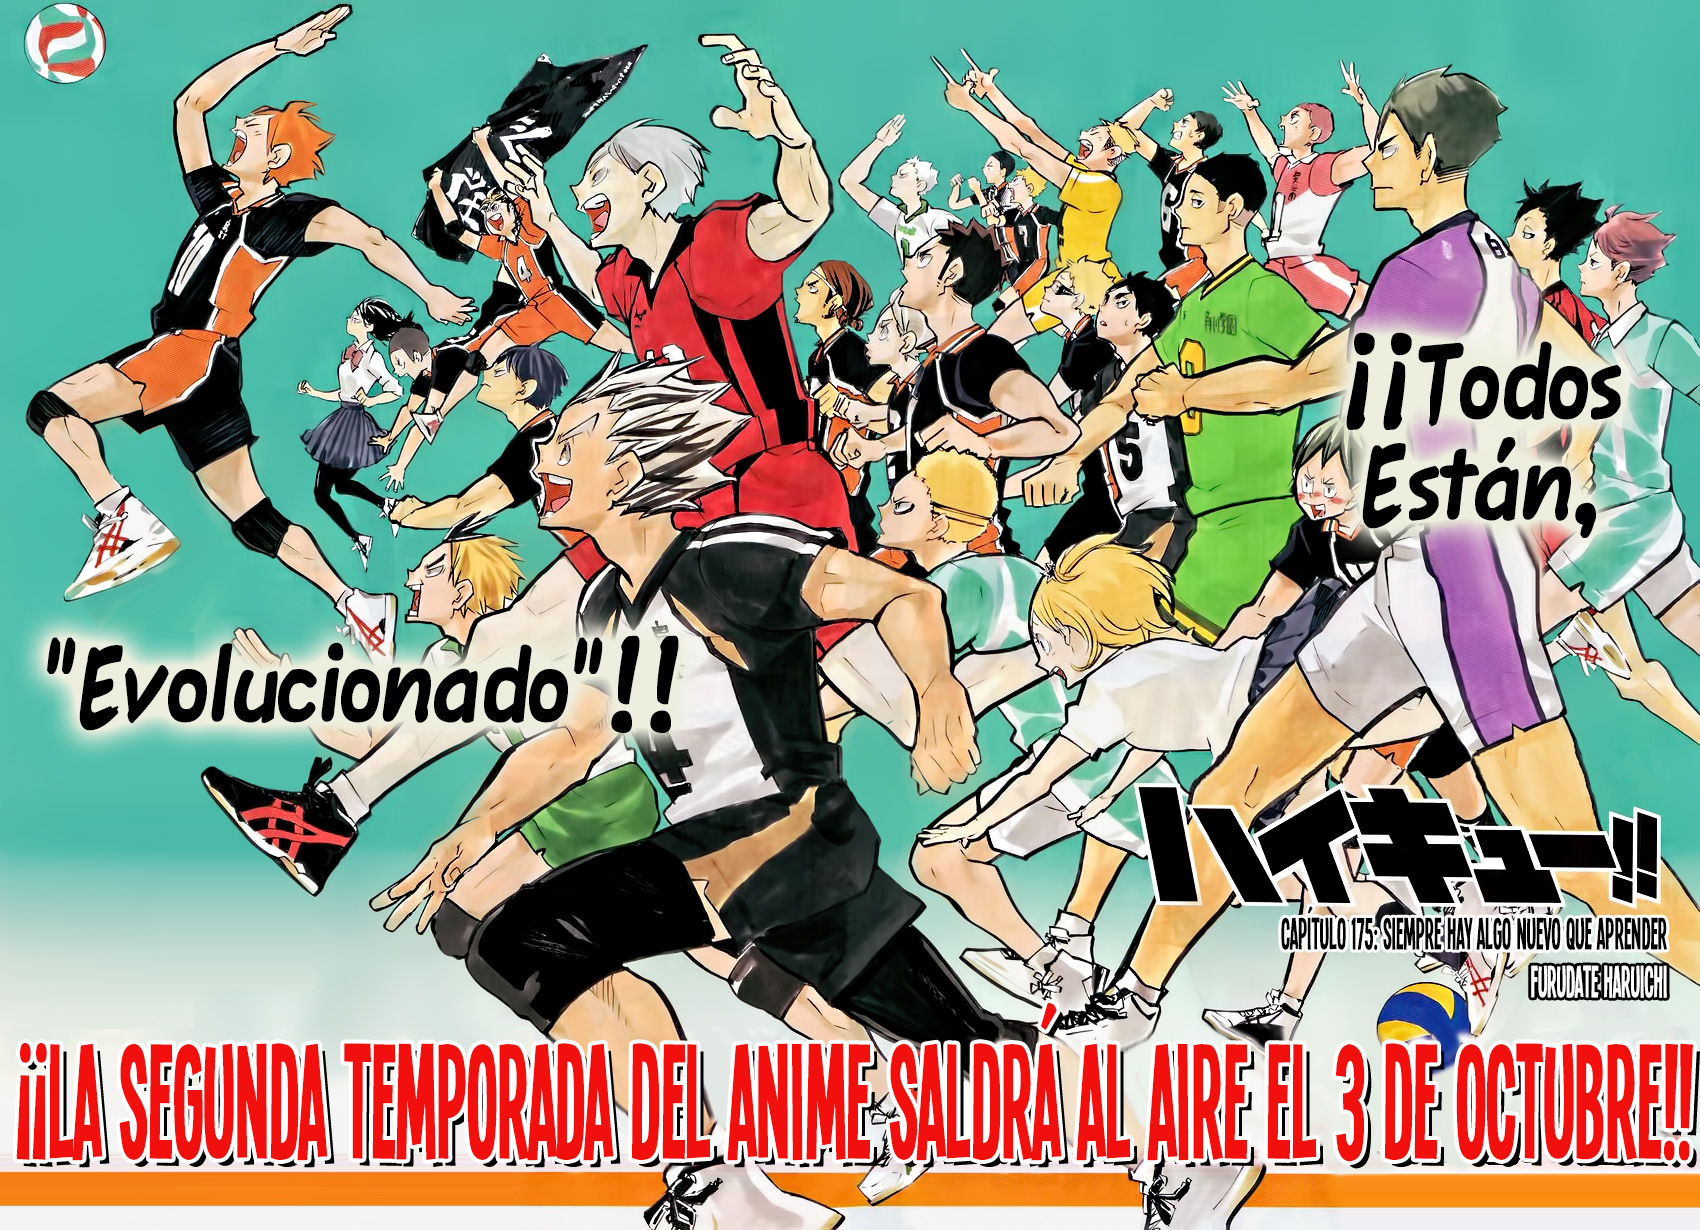 http://c5.ninemanga.com/es_manga/10/10/417770/1dd78238c3cddc9bd2da470907bba815.jpg Page 4